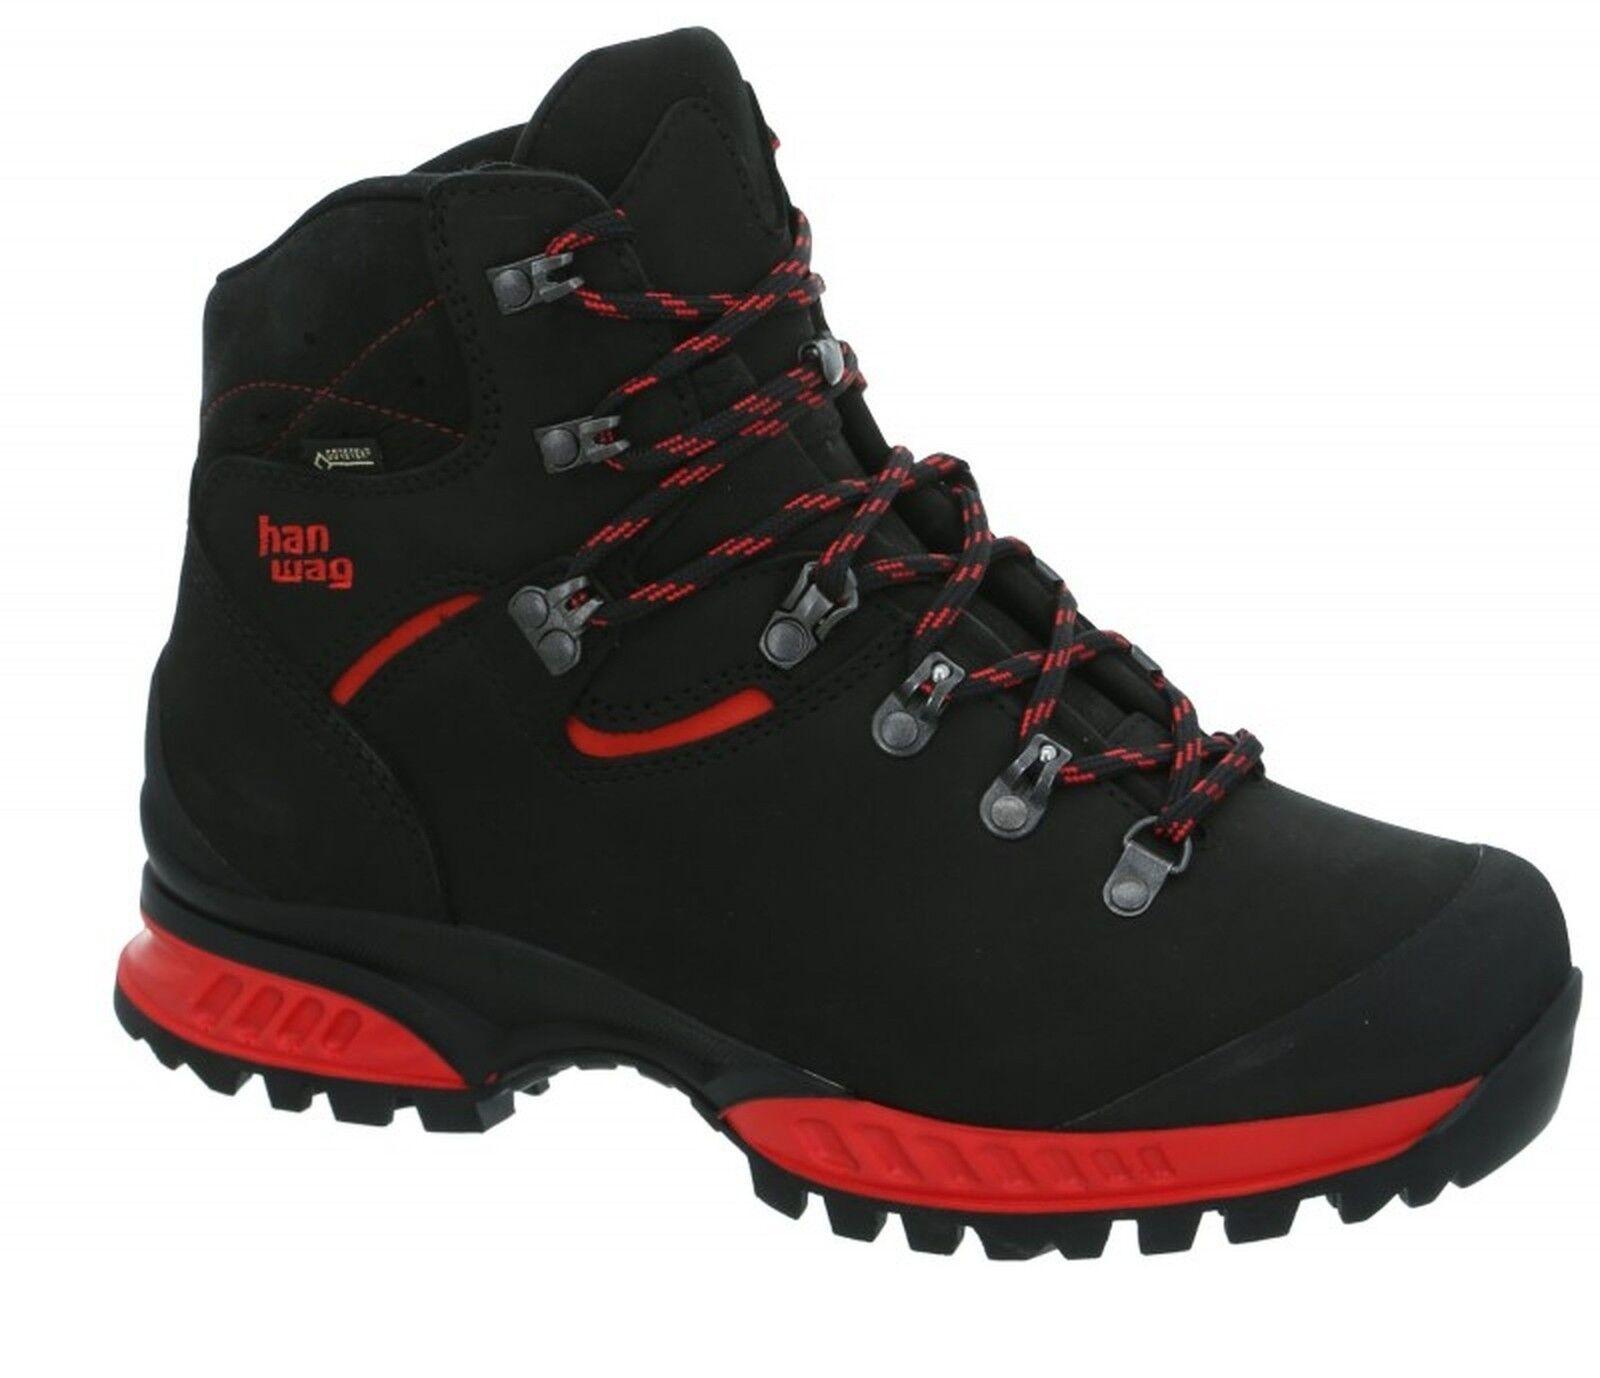 Hanwag montaña zapatos Tatra II GTX tamaño 10,5 - 45 negro-rojo